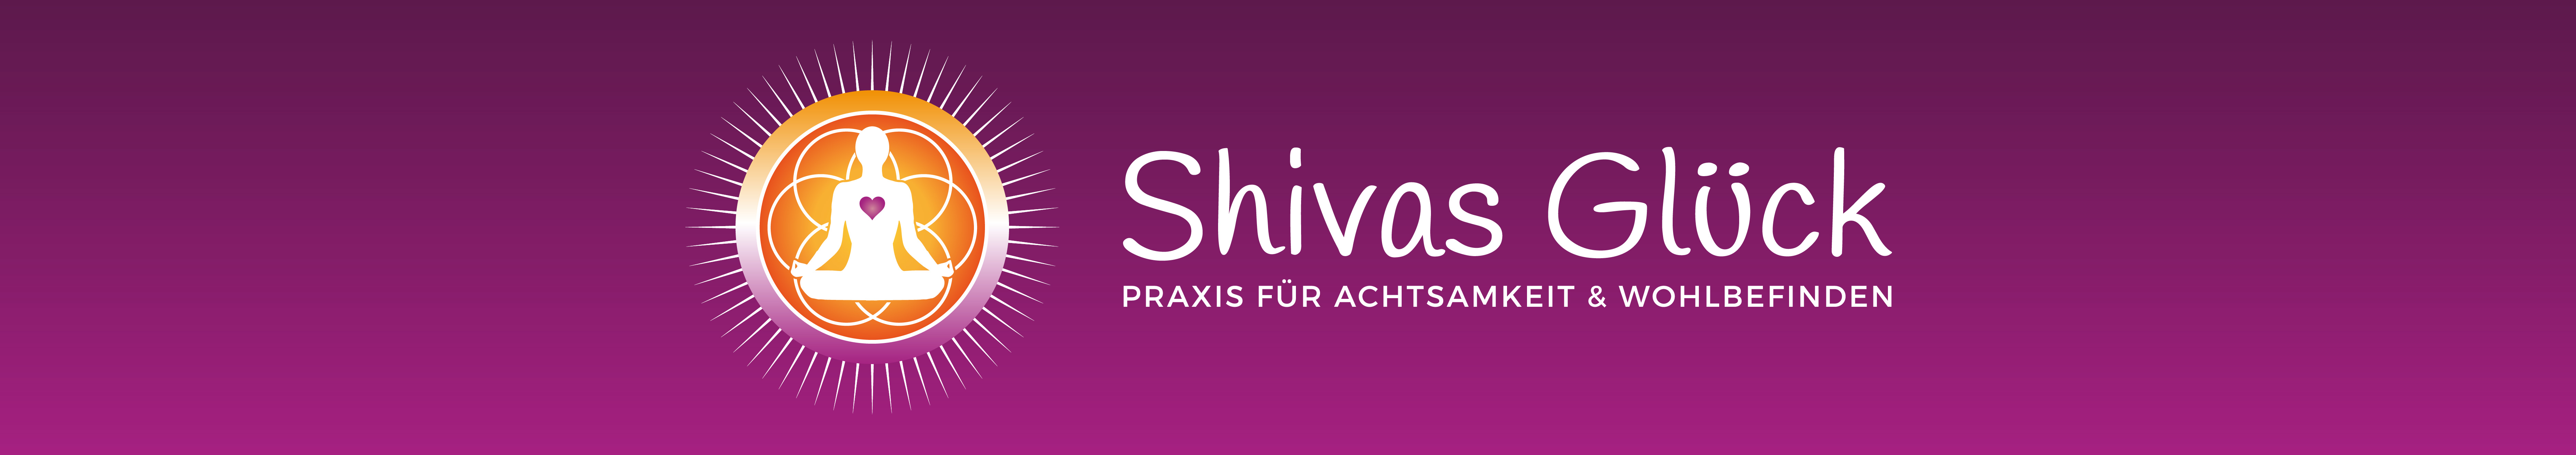 Shivas Glück